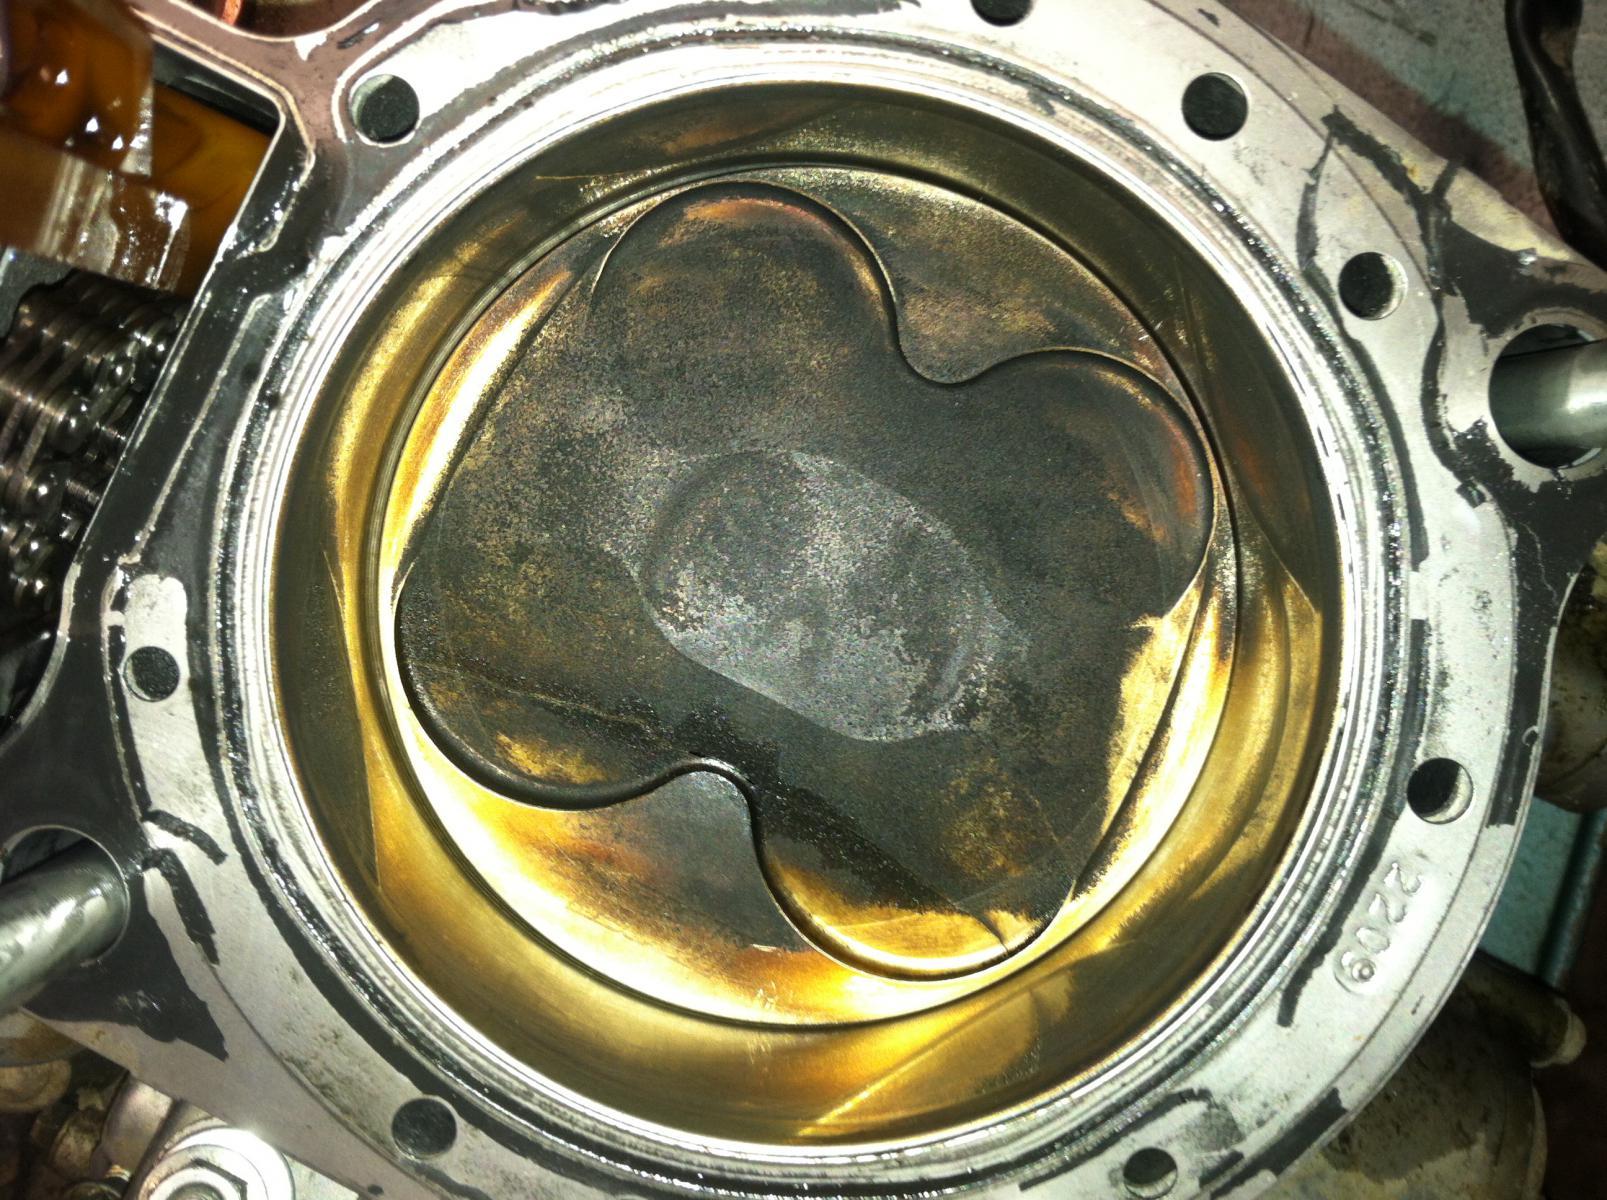 TRX450R TRX 450R 96mm Stock Bore 12.8:1 Pro Series 3 Ring JE Piston Gaskets 06